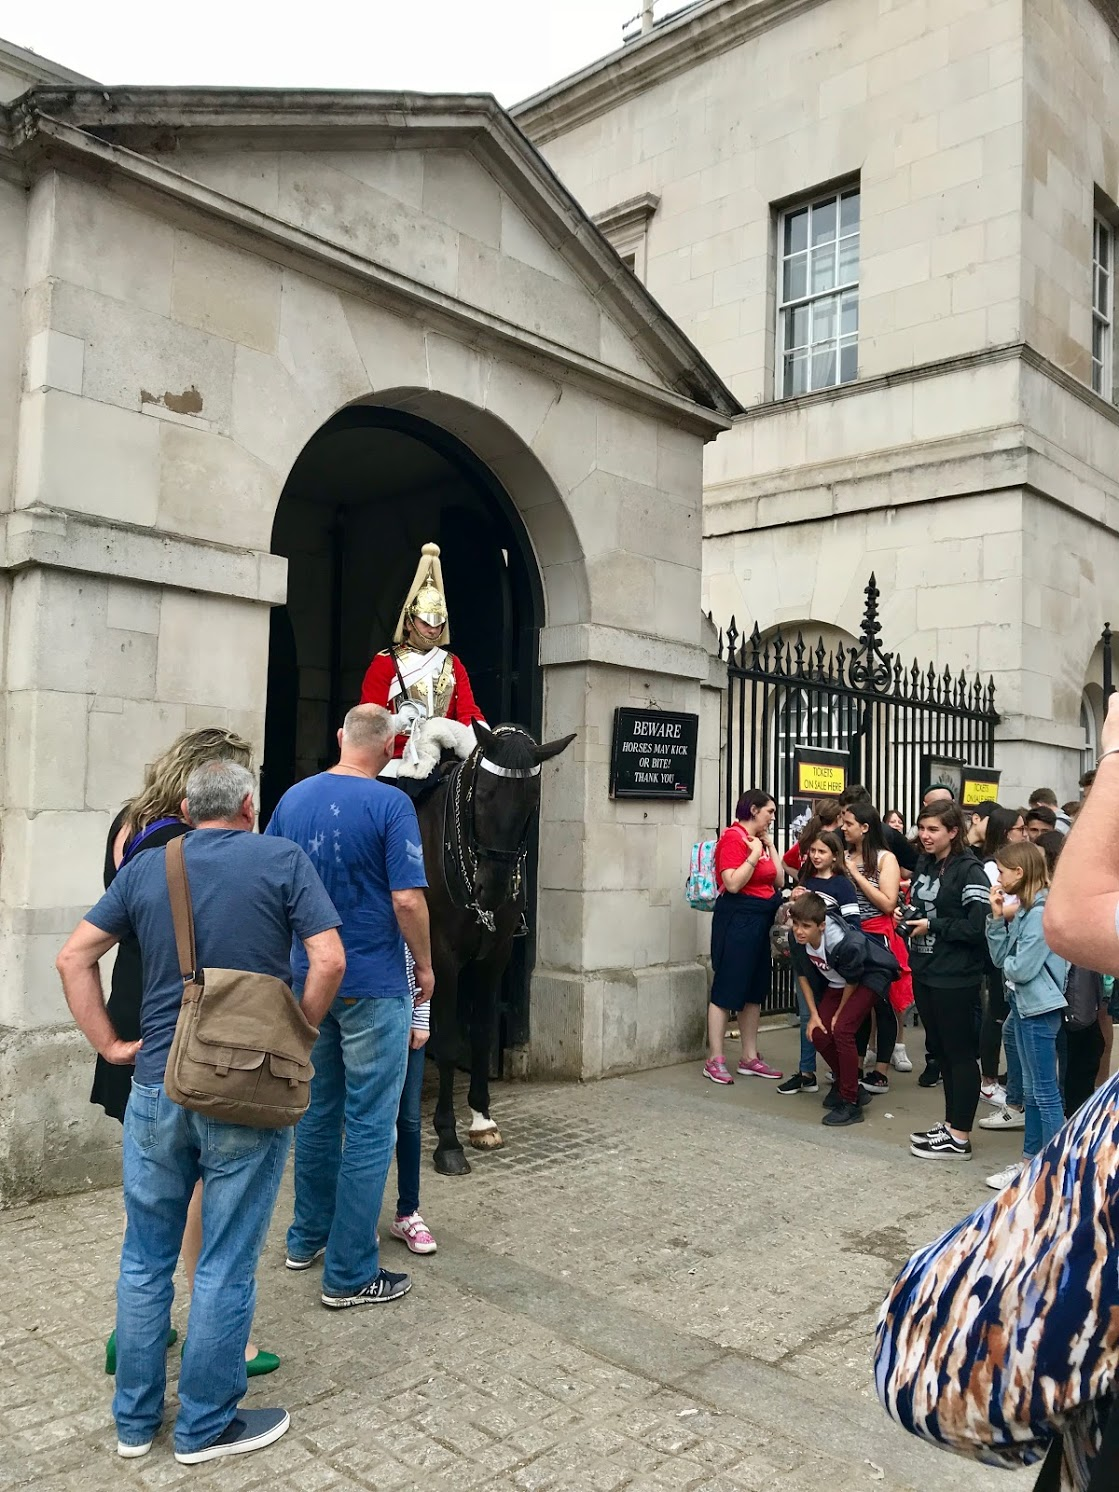 london guard on horse.jpg